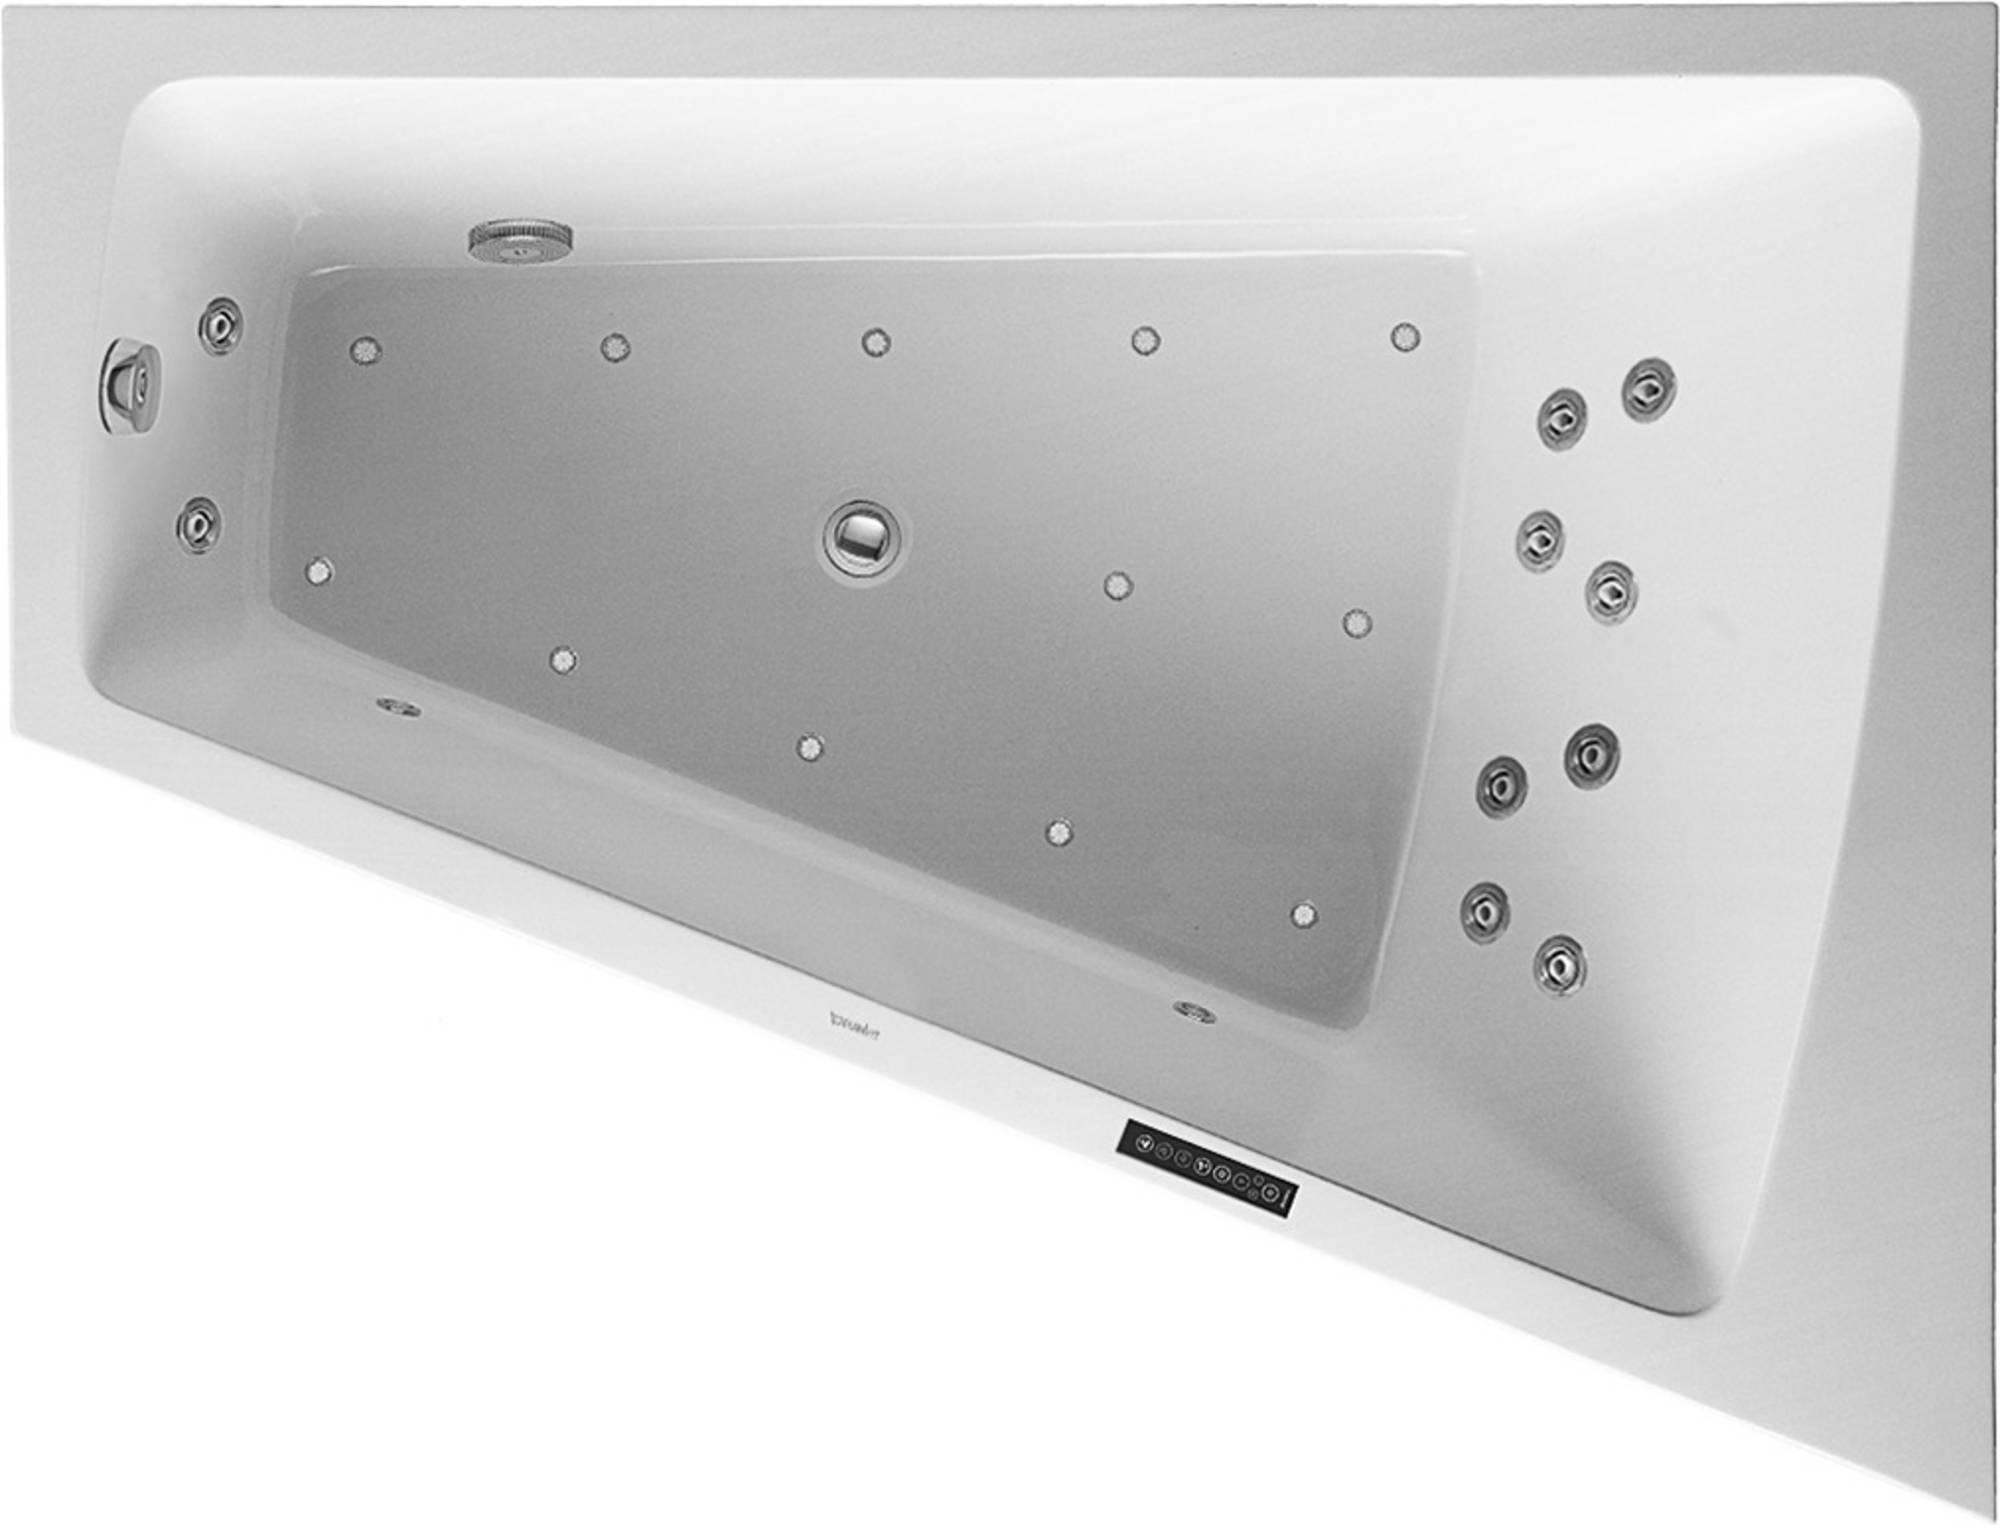 Duravit Paiova Systeembad 225 liter Acryl 170x130 cm Wit